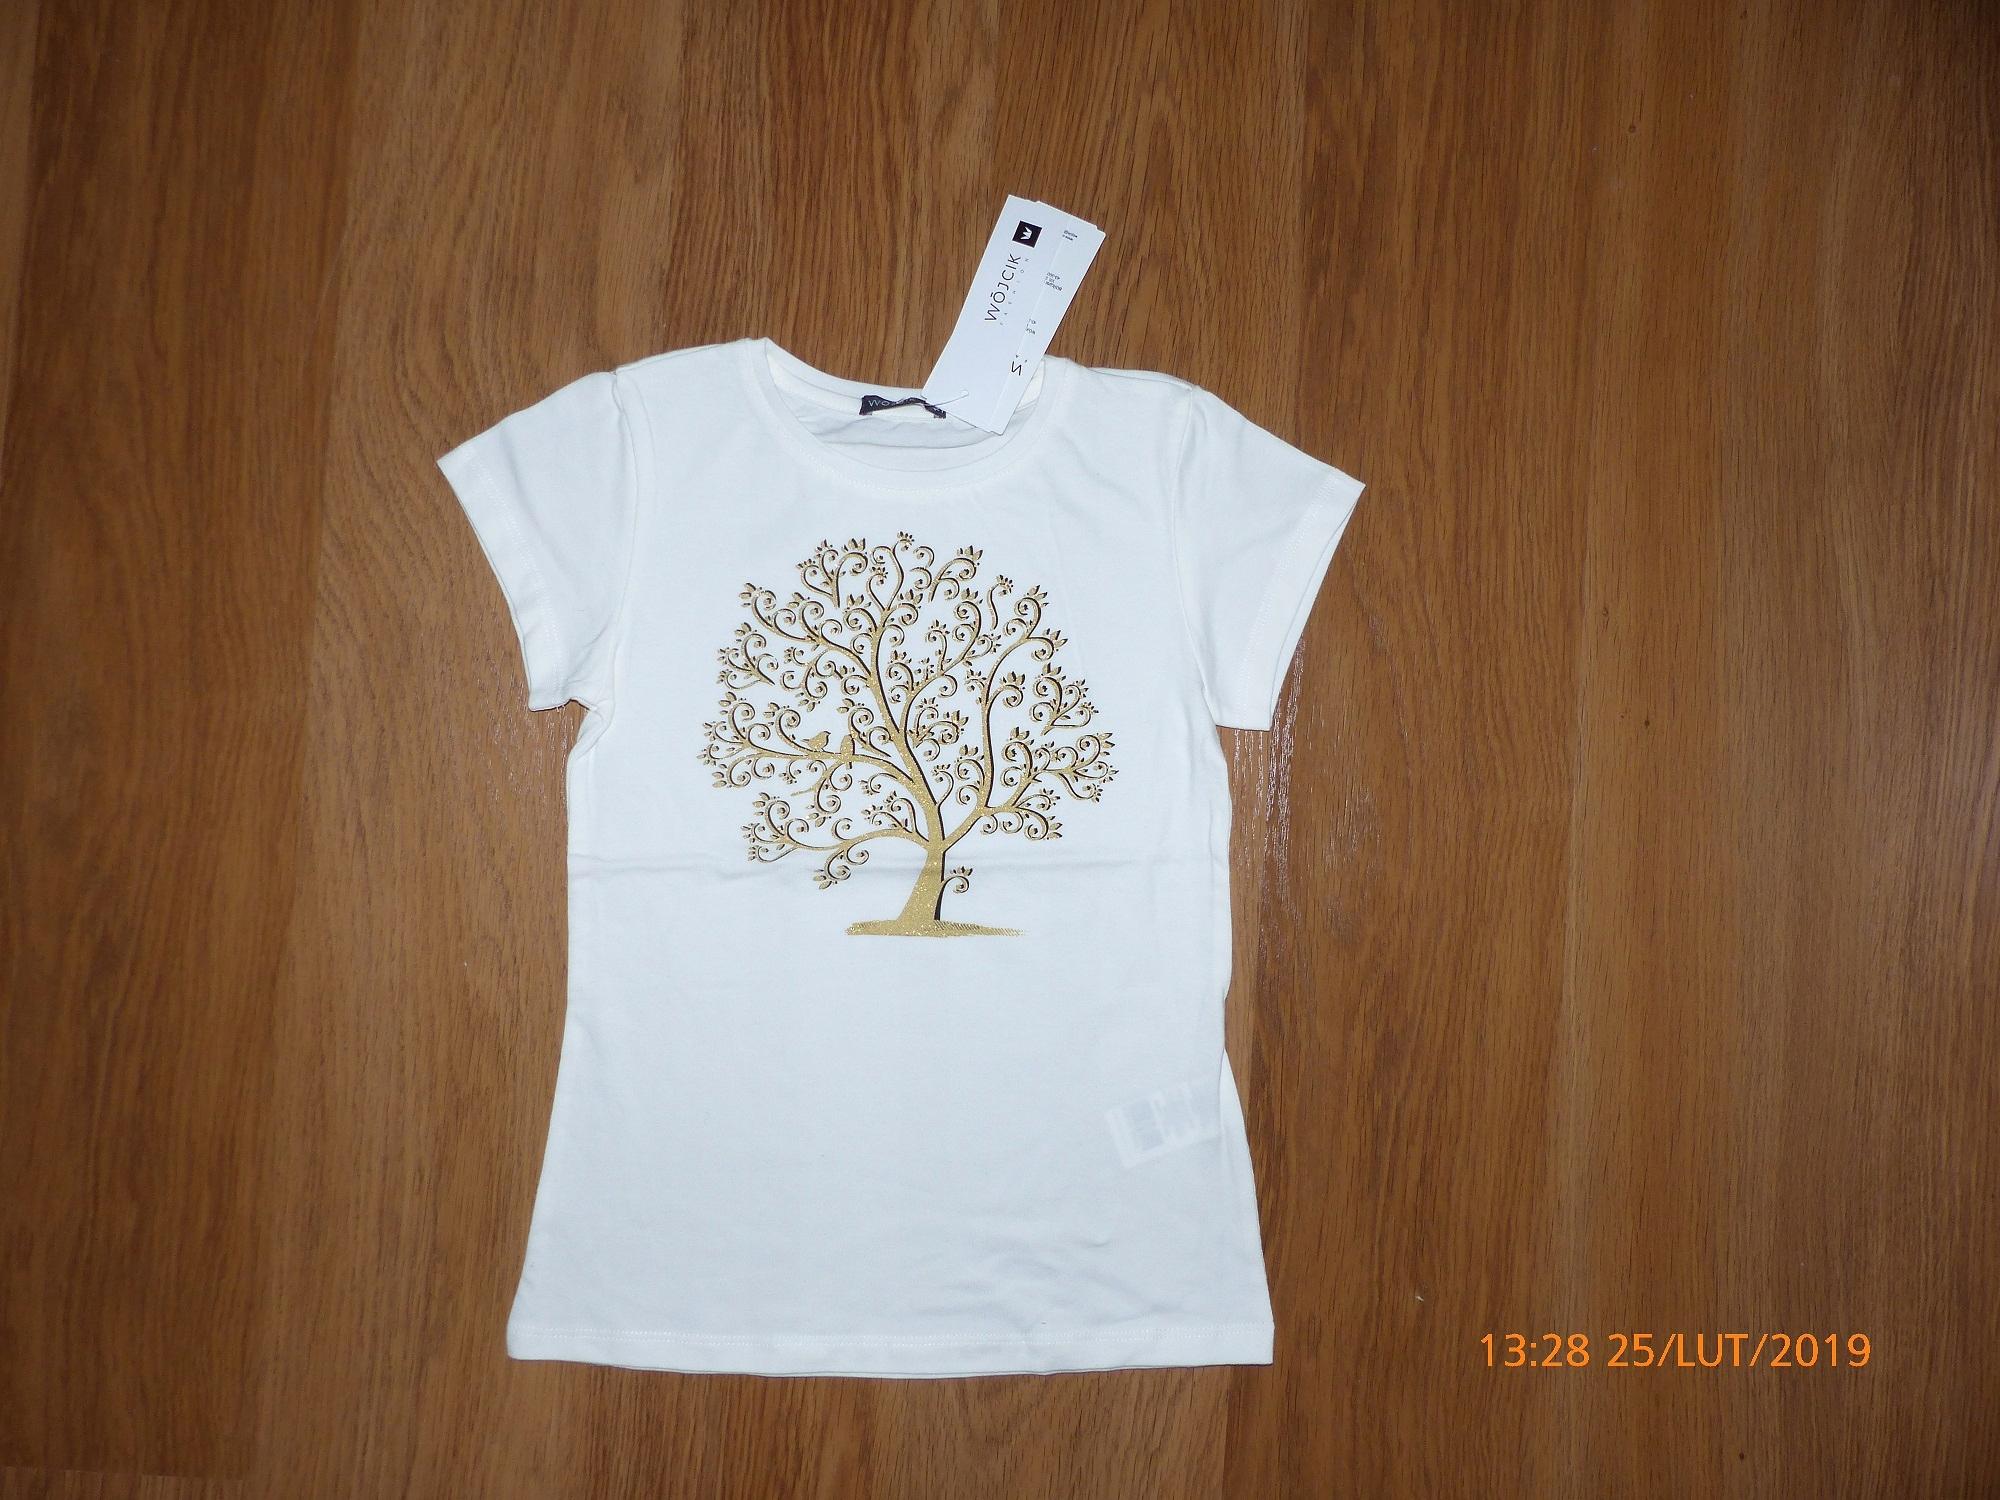 Wójcik koszulka 140cm NOWA